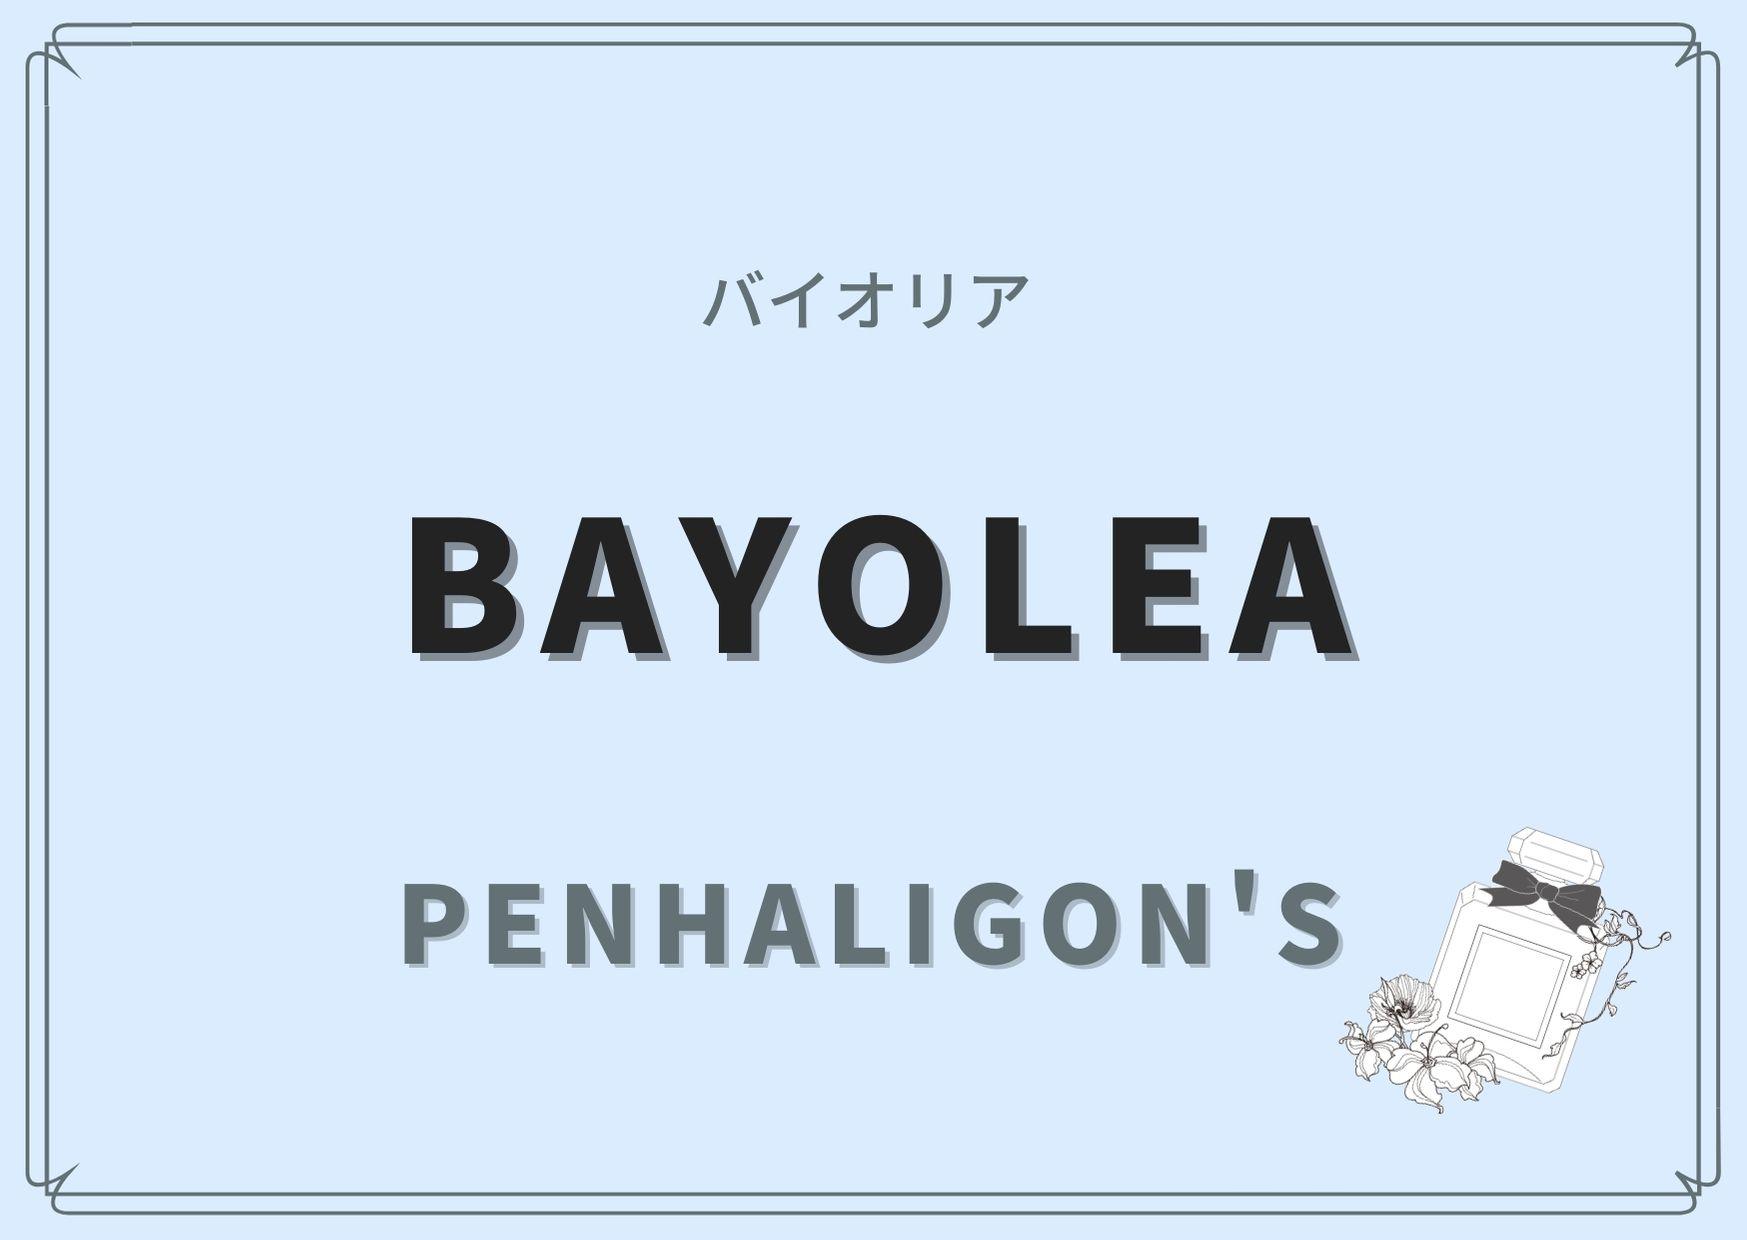 BAYOLEA(バイオリア)/ PENHALIGON'S(ペンハリガン)